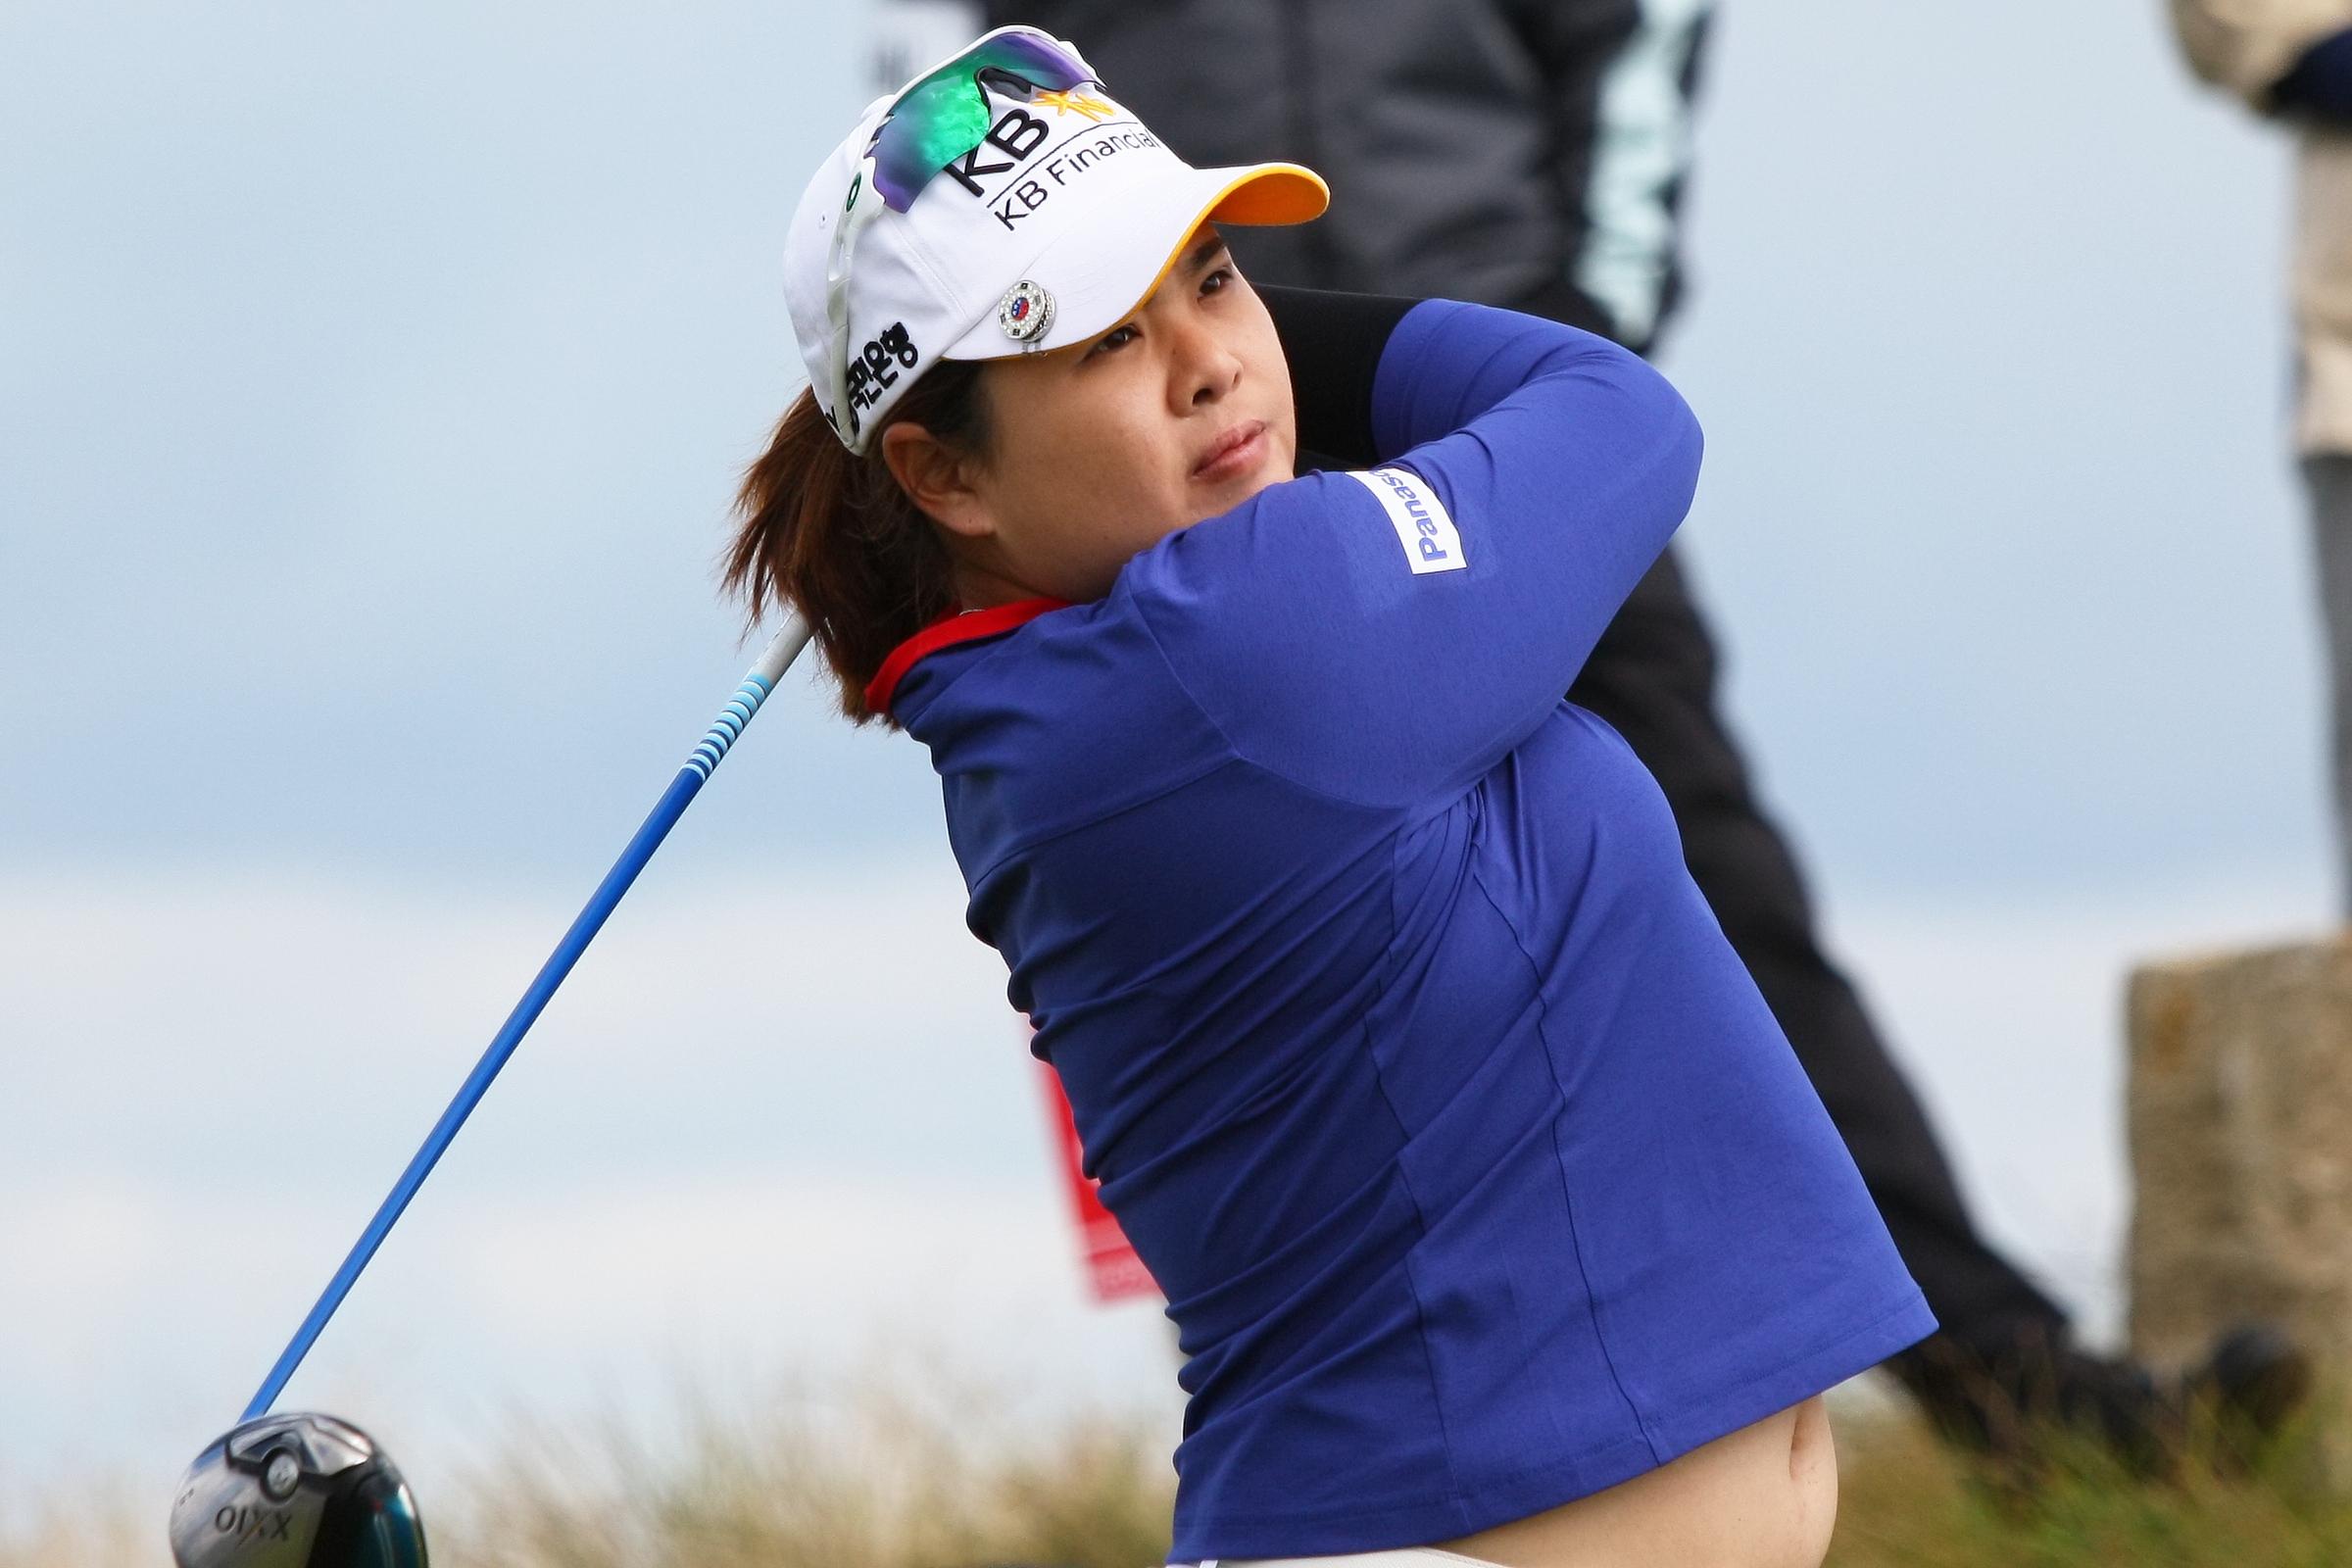 2021 Women's PGA Championship predictions